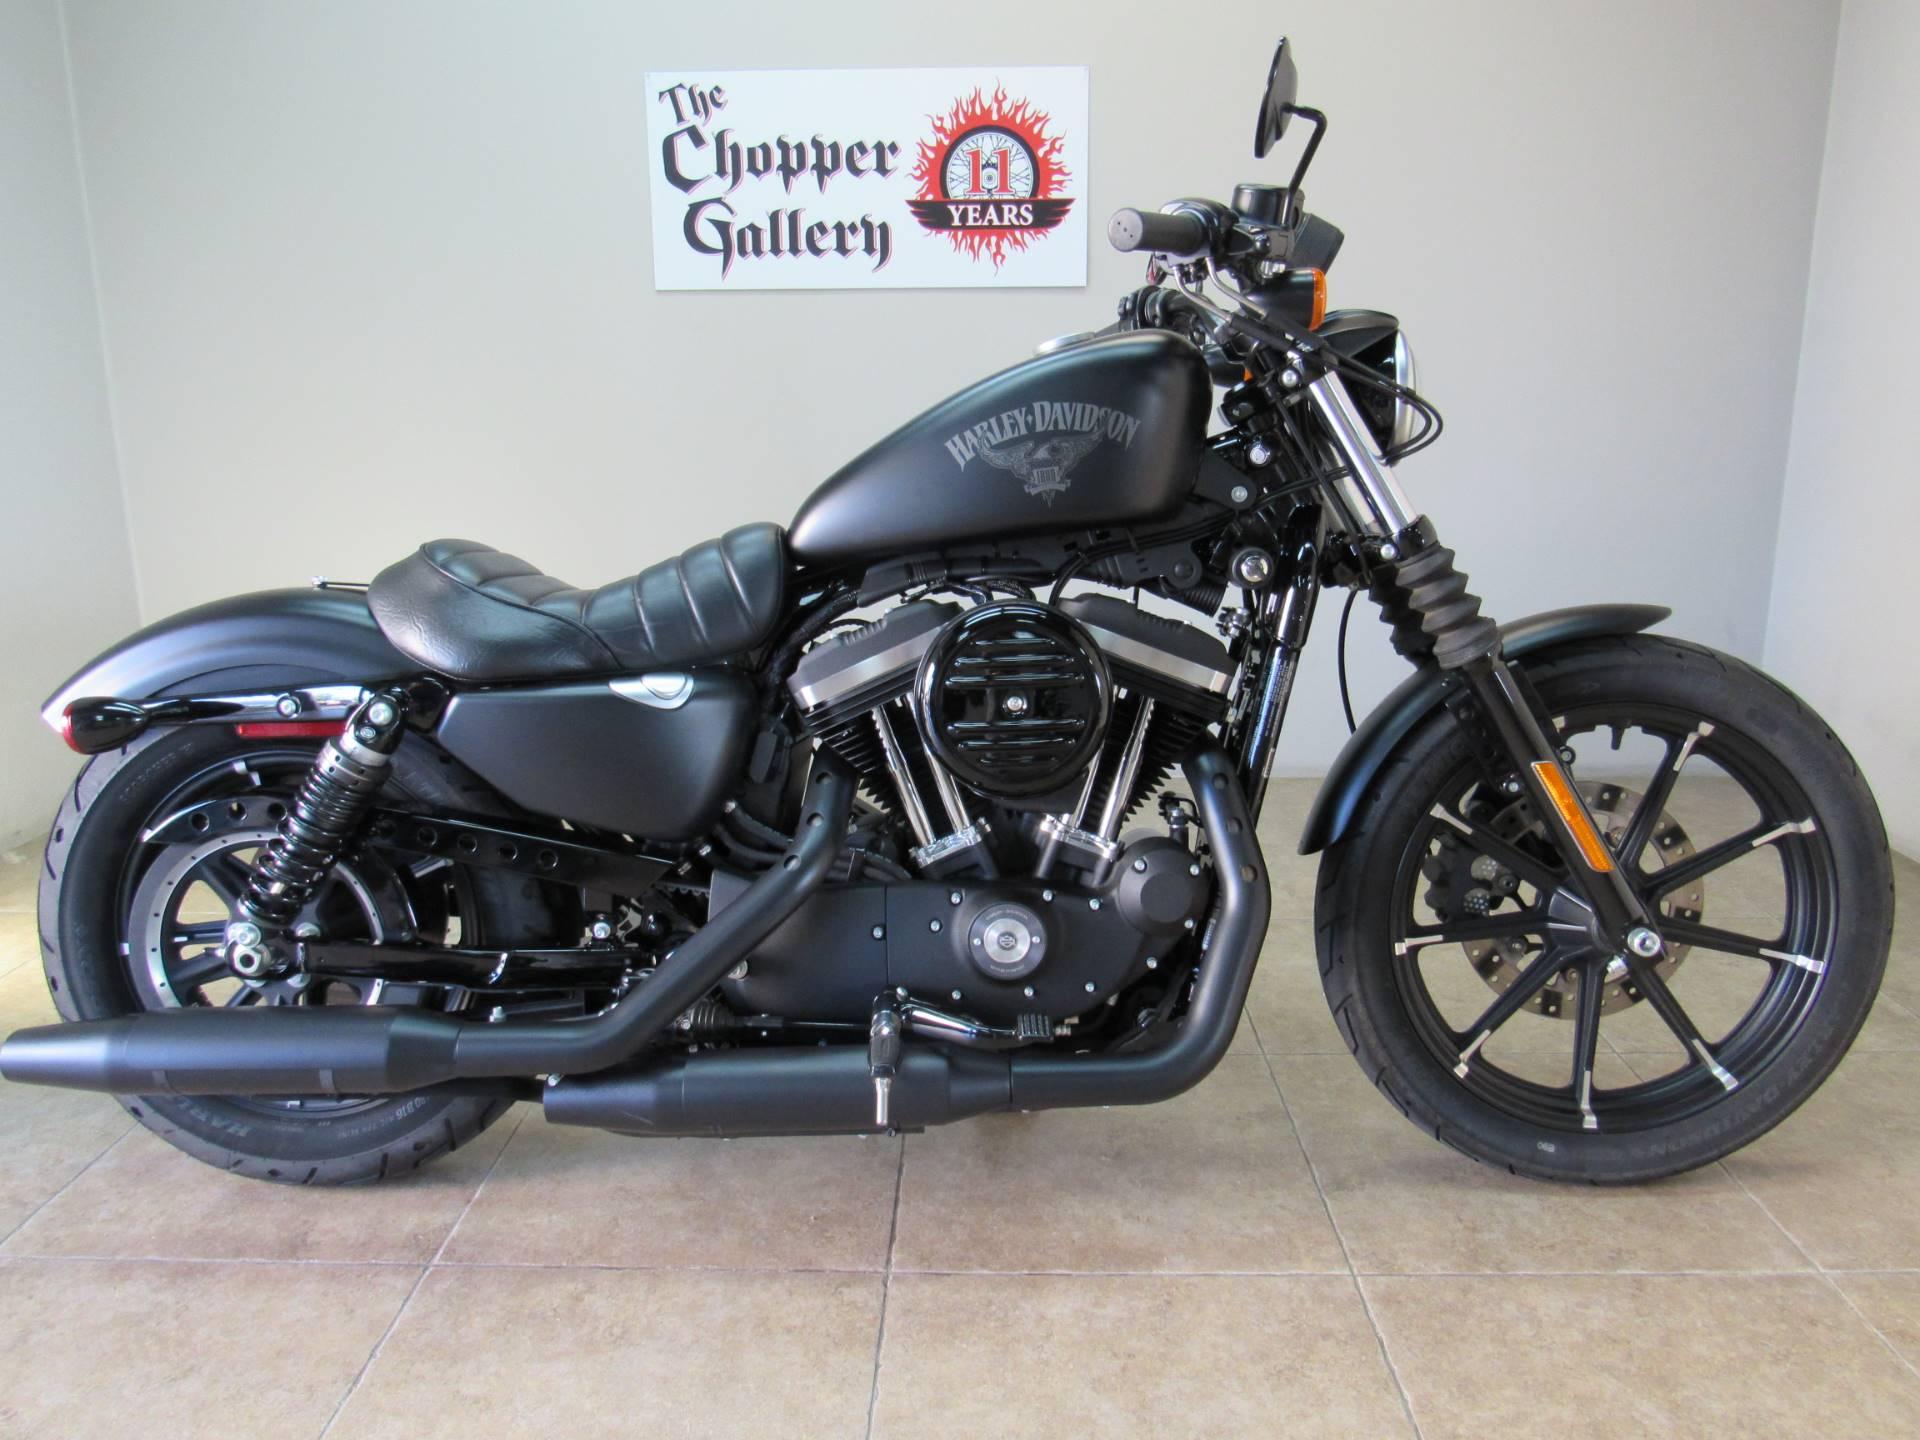 2017 Harley Davidson Iron 883 In Temecula California Photo 15